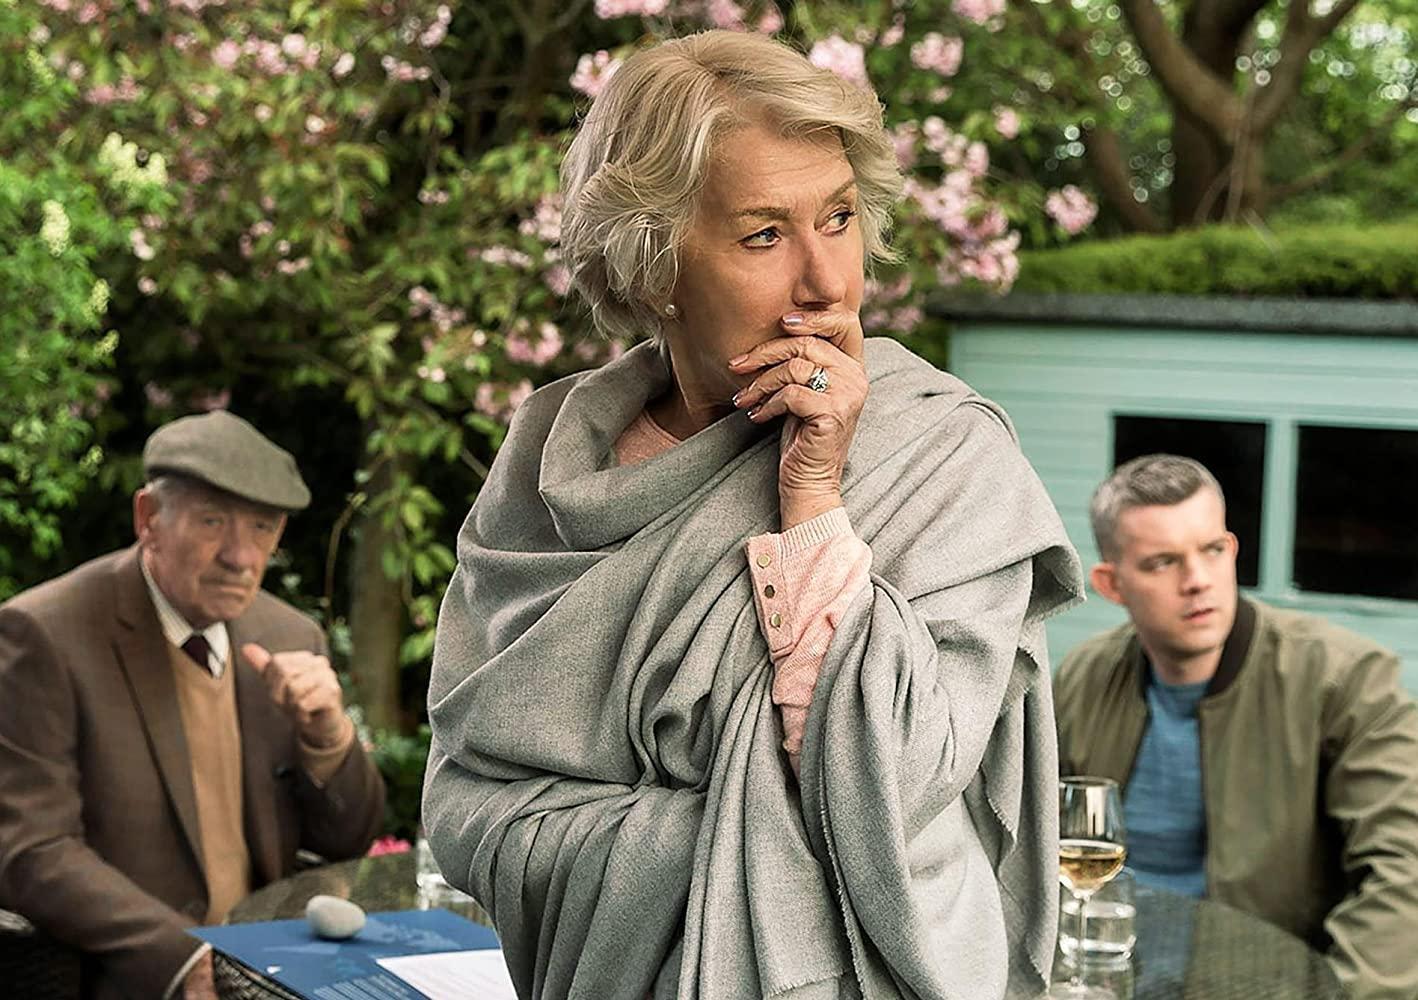 La Gran Mentira 2019 Filmaffinity